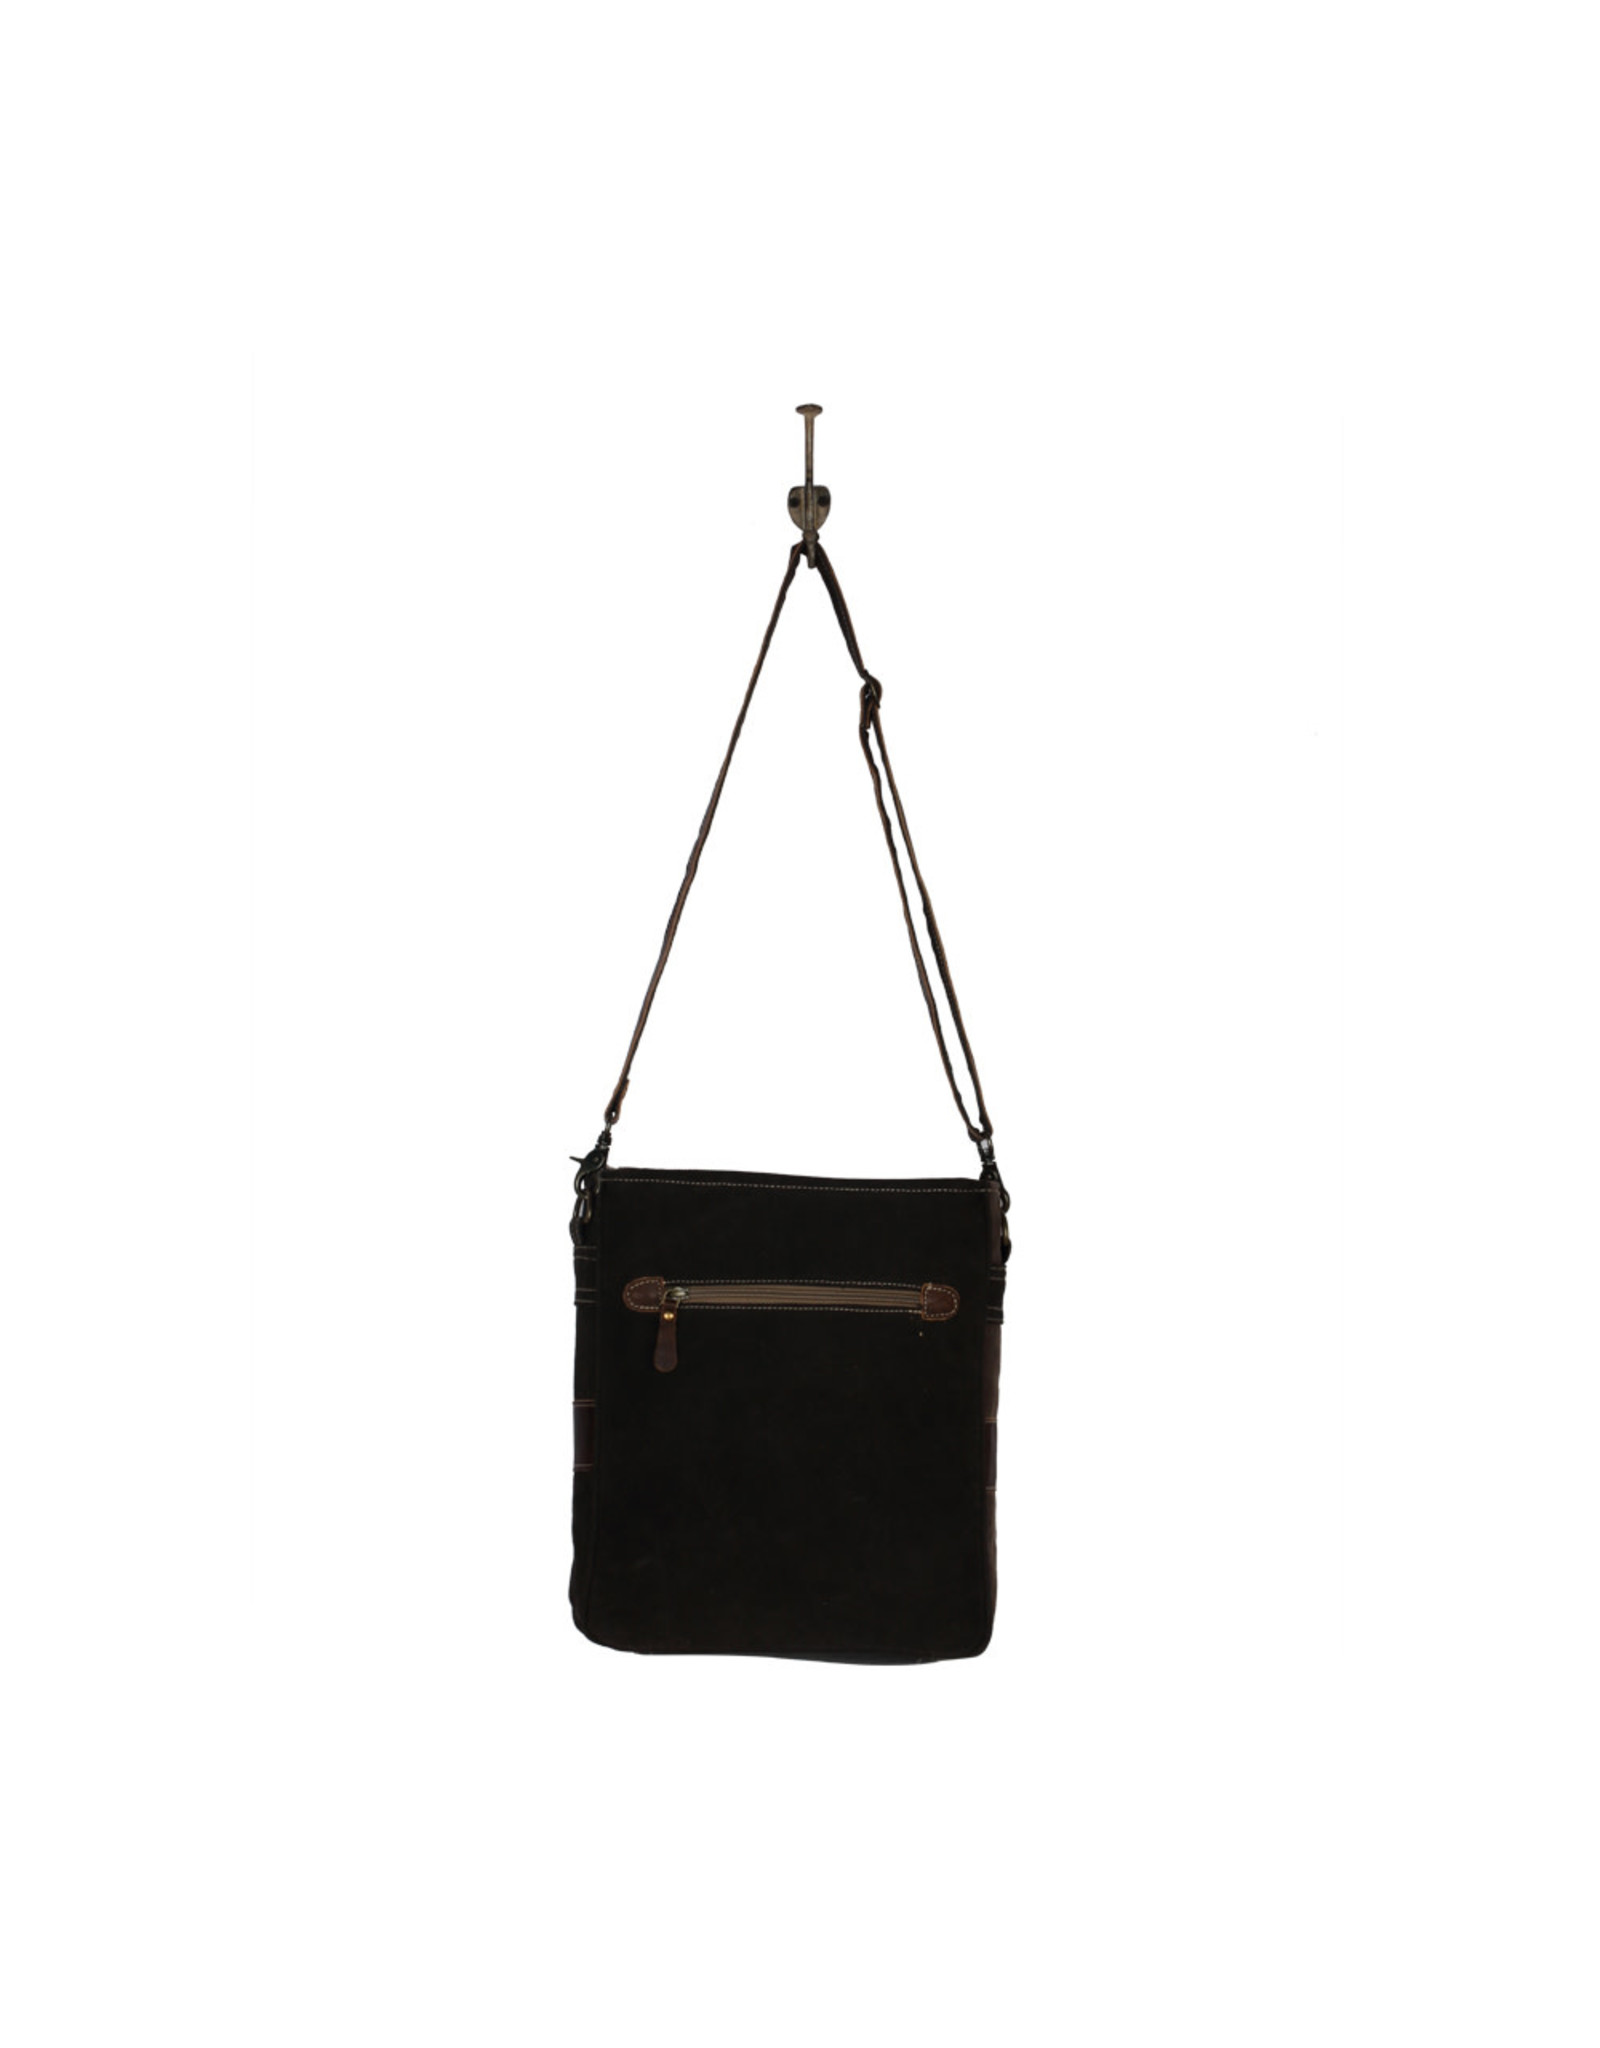 Myra Bags S-2104 Pro forma Shoulder Bag